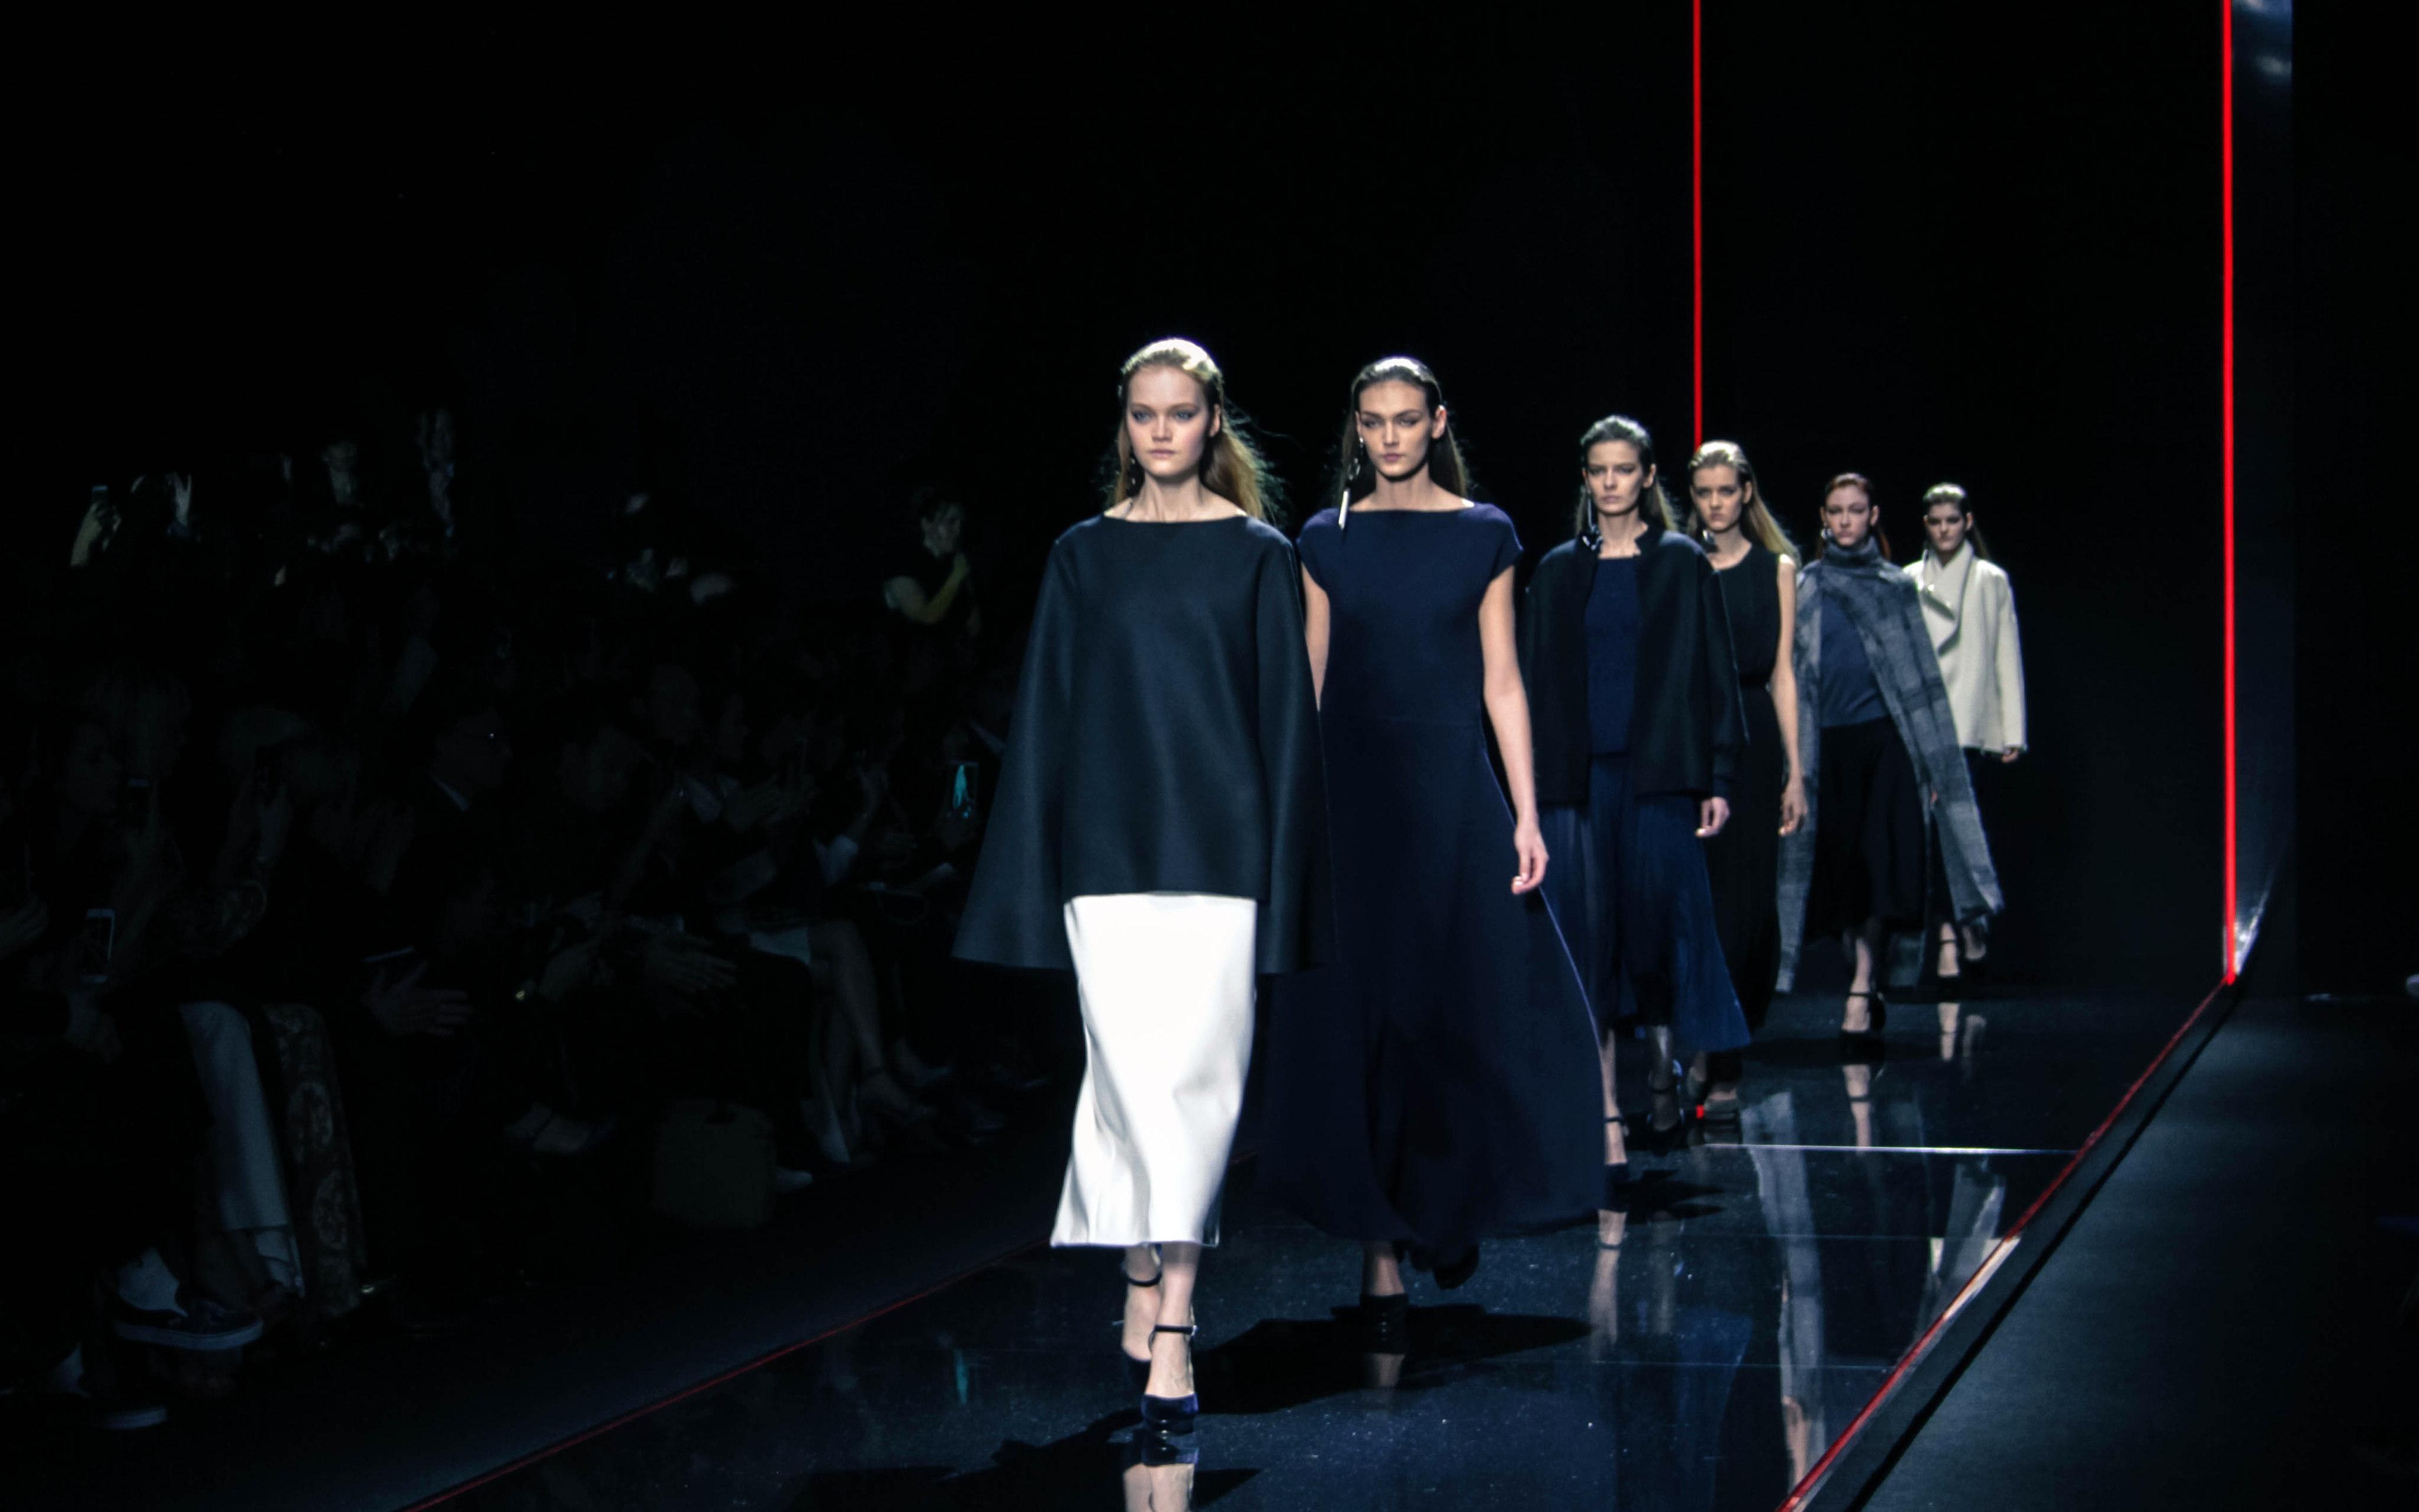 Anteprima fall winter 2015 2016 milan fashion show news for Milan show 2016